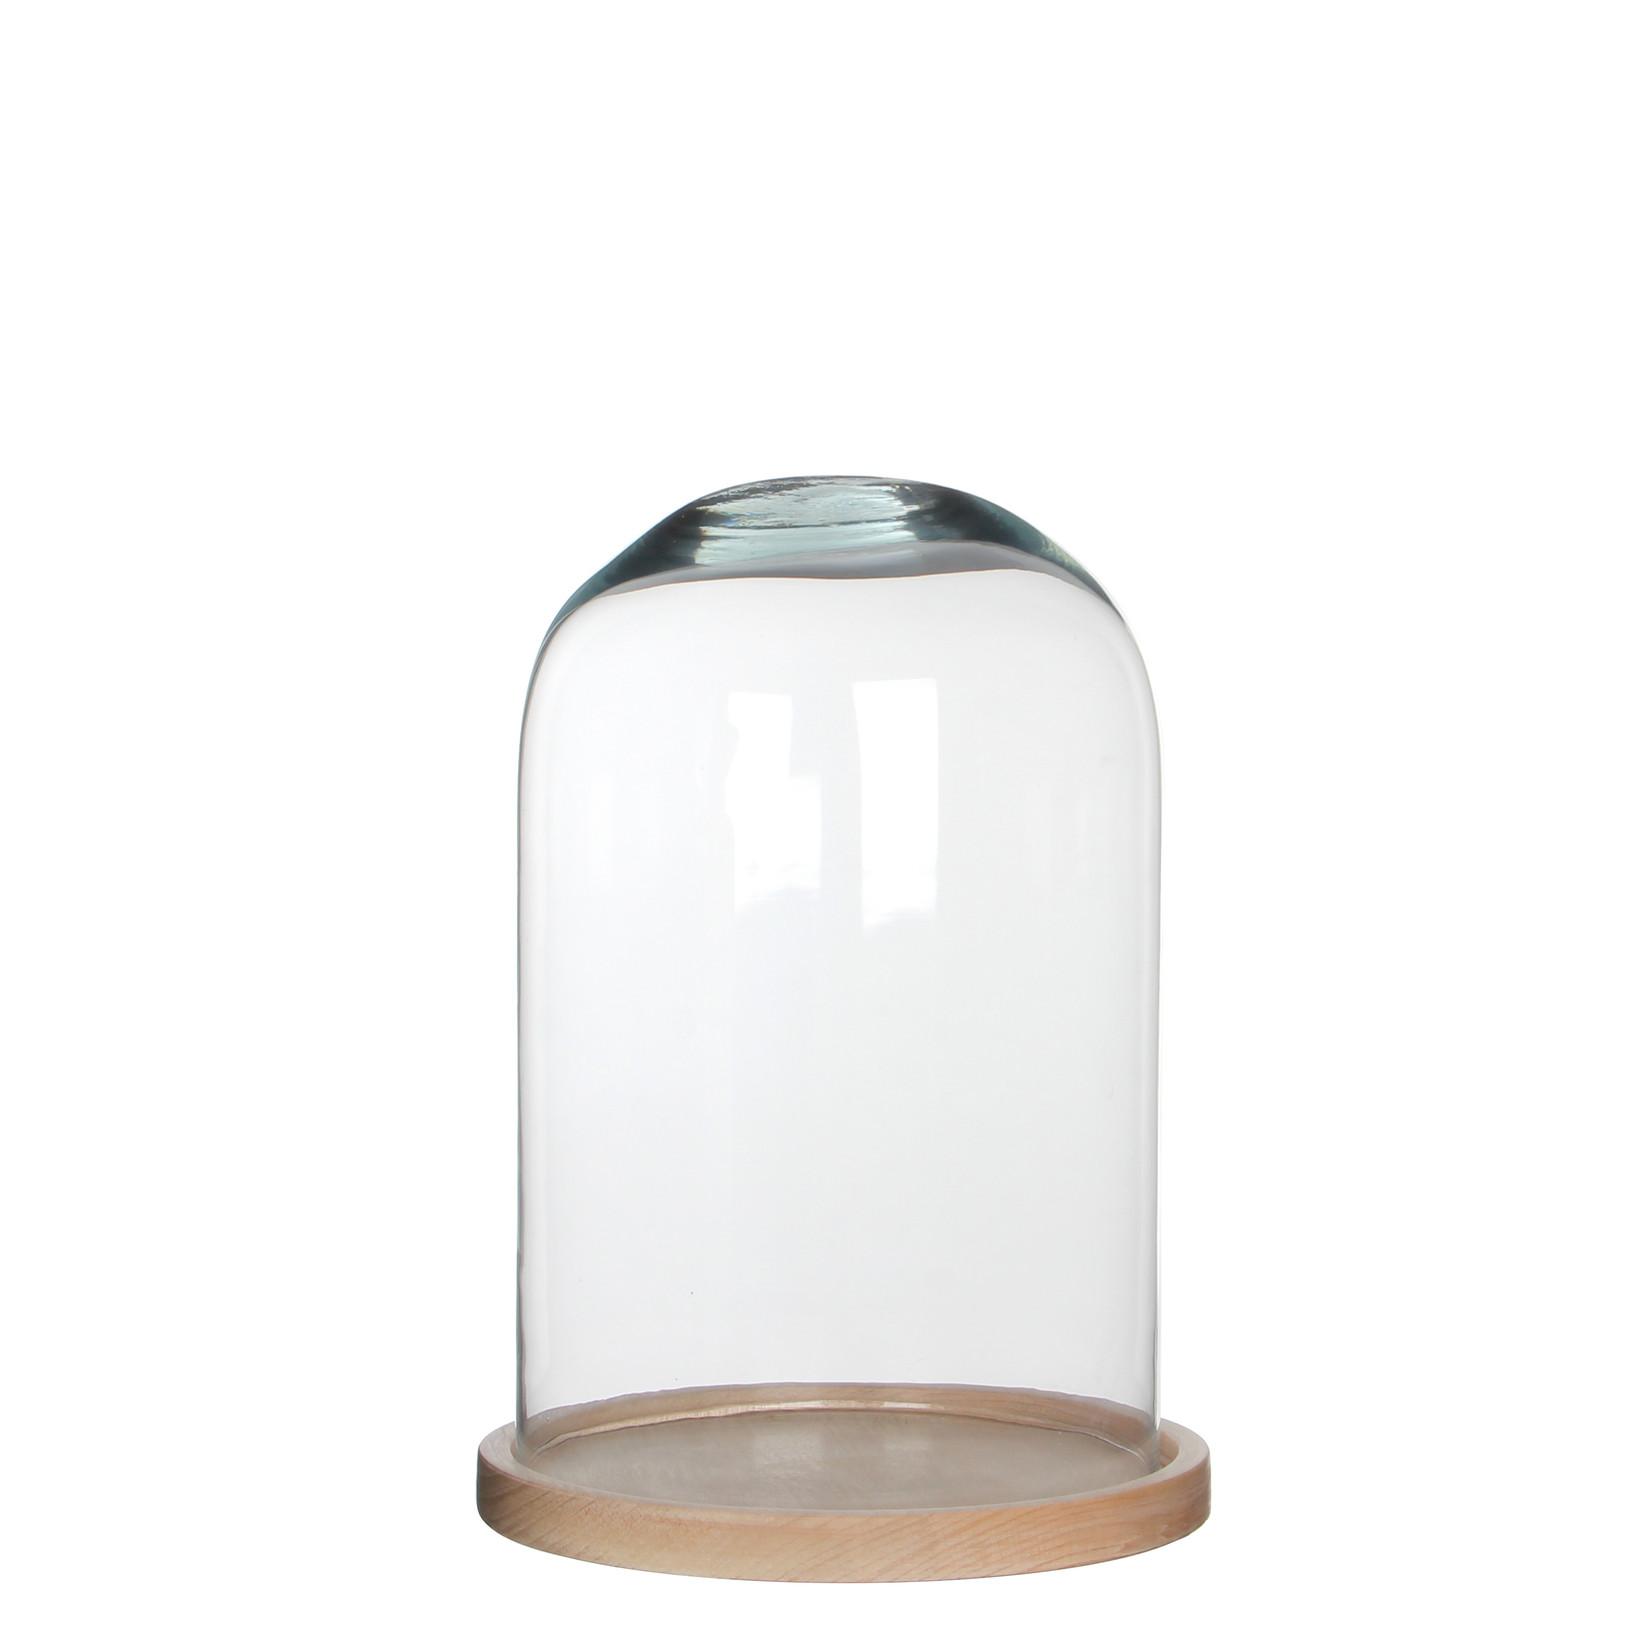 MiCa 242312 Bell jar Hella wood M